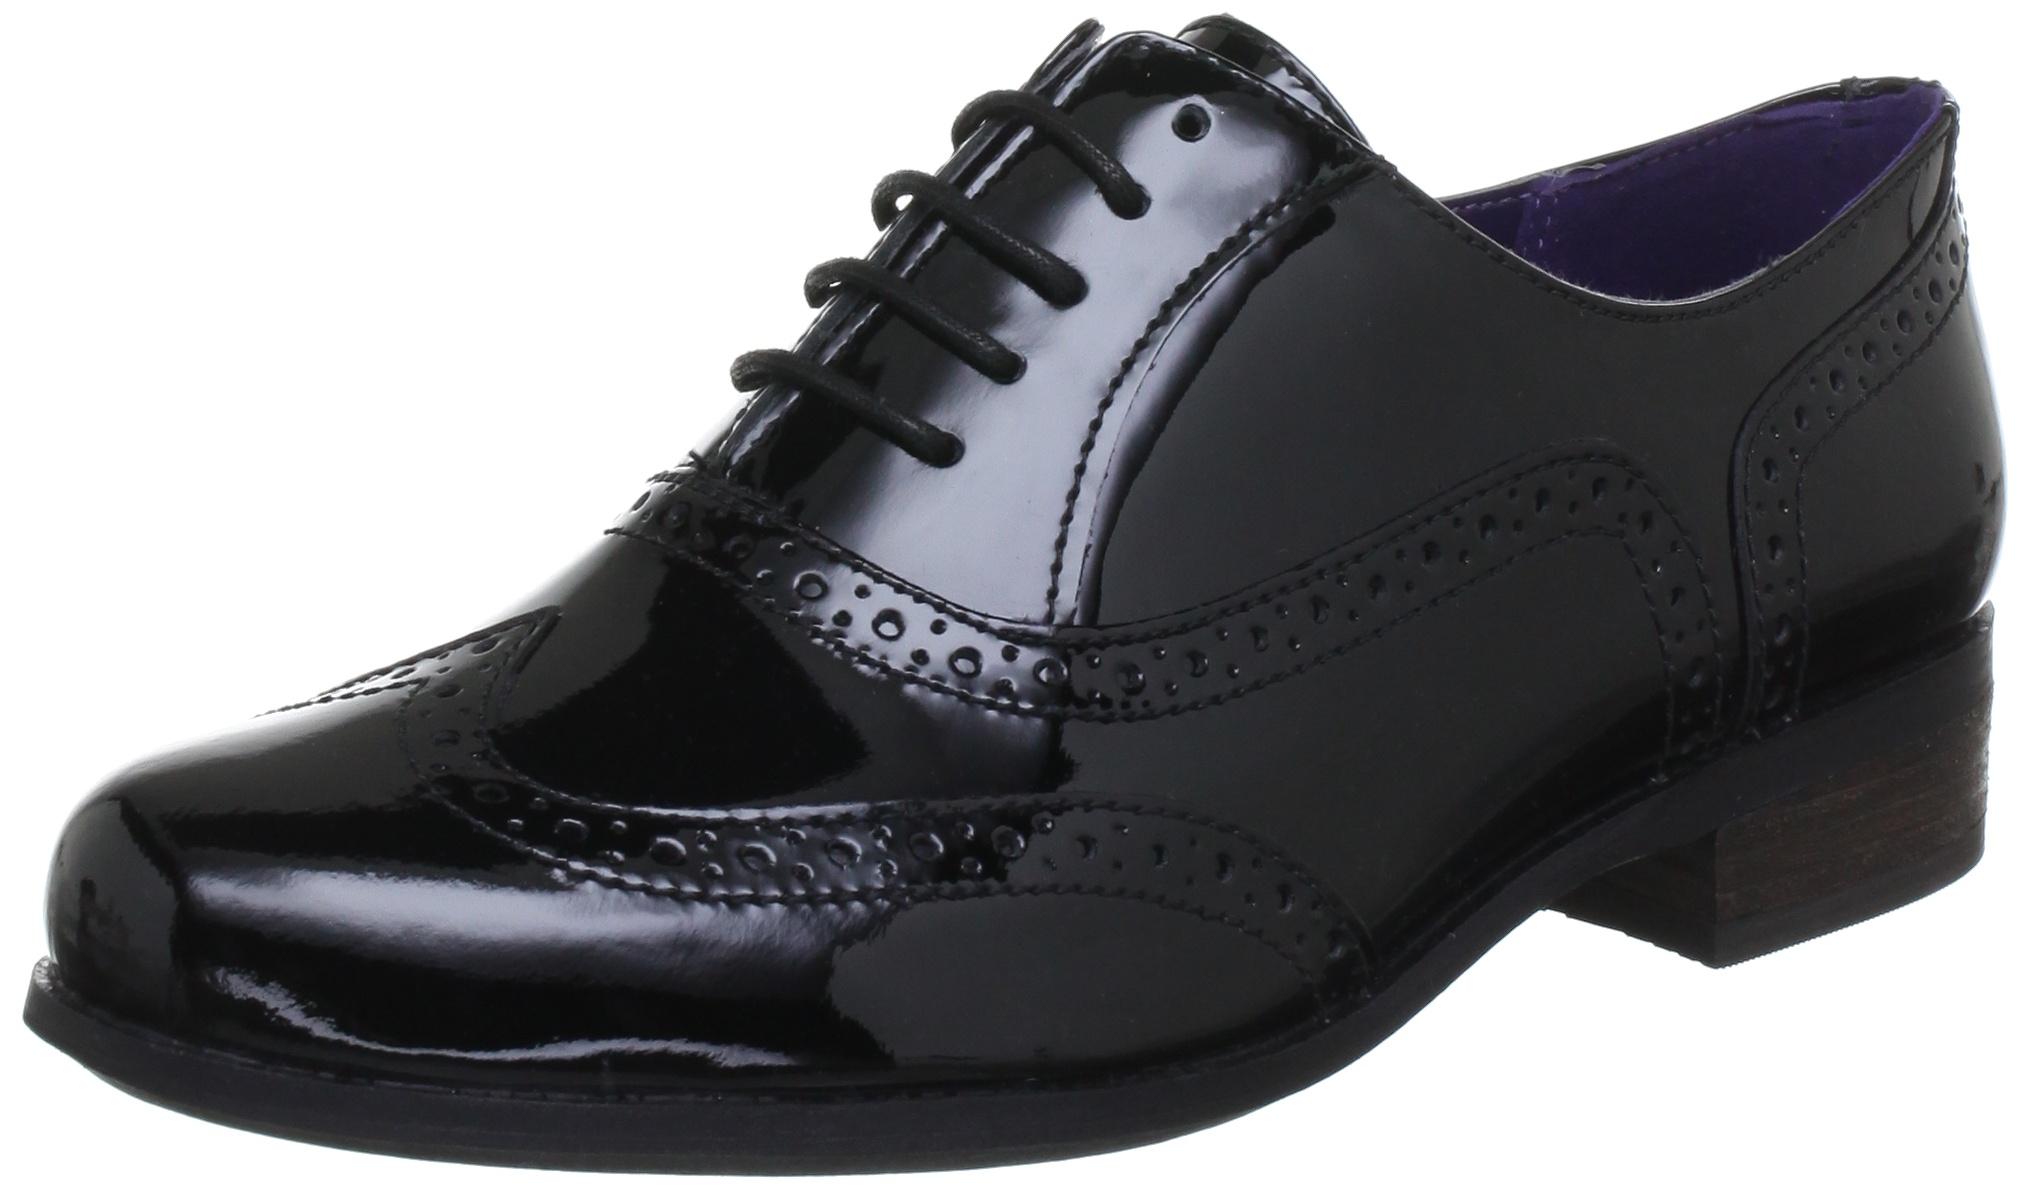 Top Chaussures Femme Selon Les Notes Dpukfyxa-150542-1545285 Vente